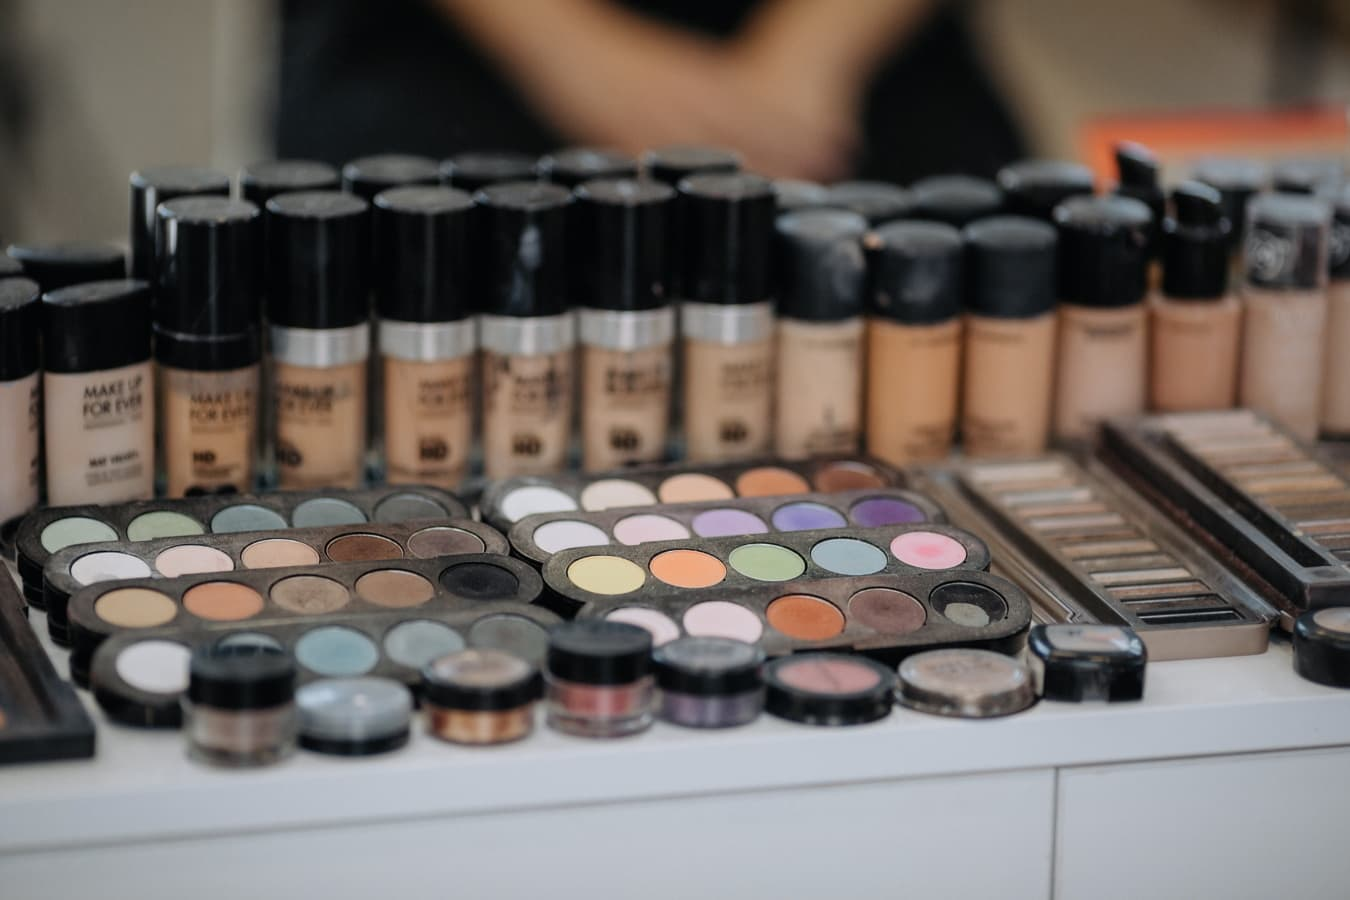 cosmetics, salon, powder, makeup, colors, professional, merchandise, products, crayon, checker